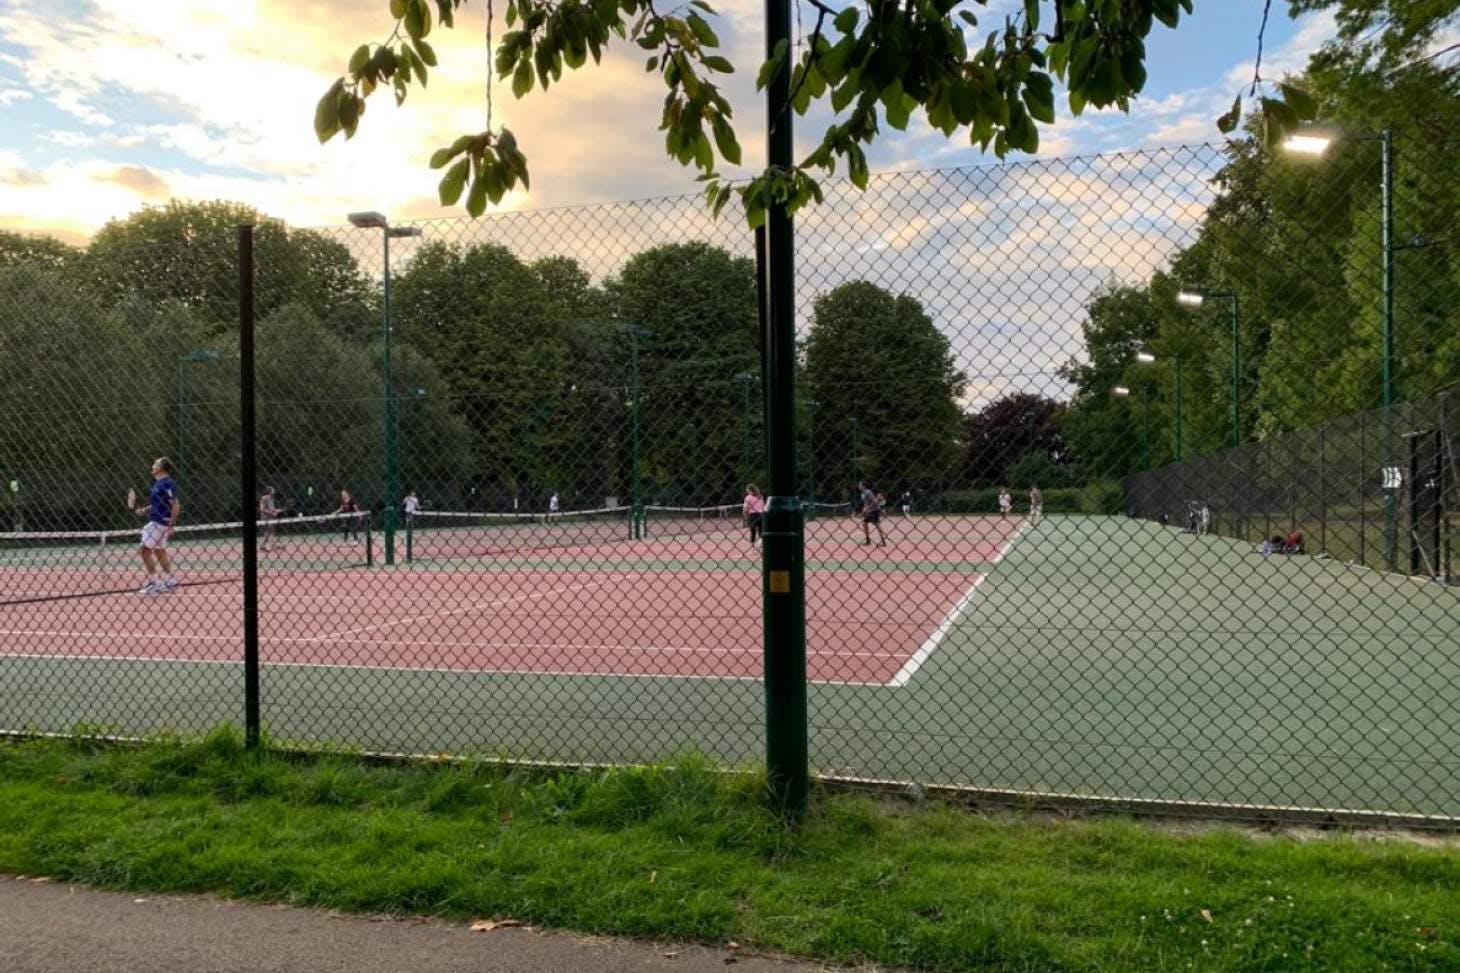 Florence Park Outdoor | Hard (macadam) tennis court